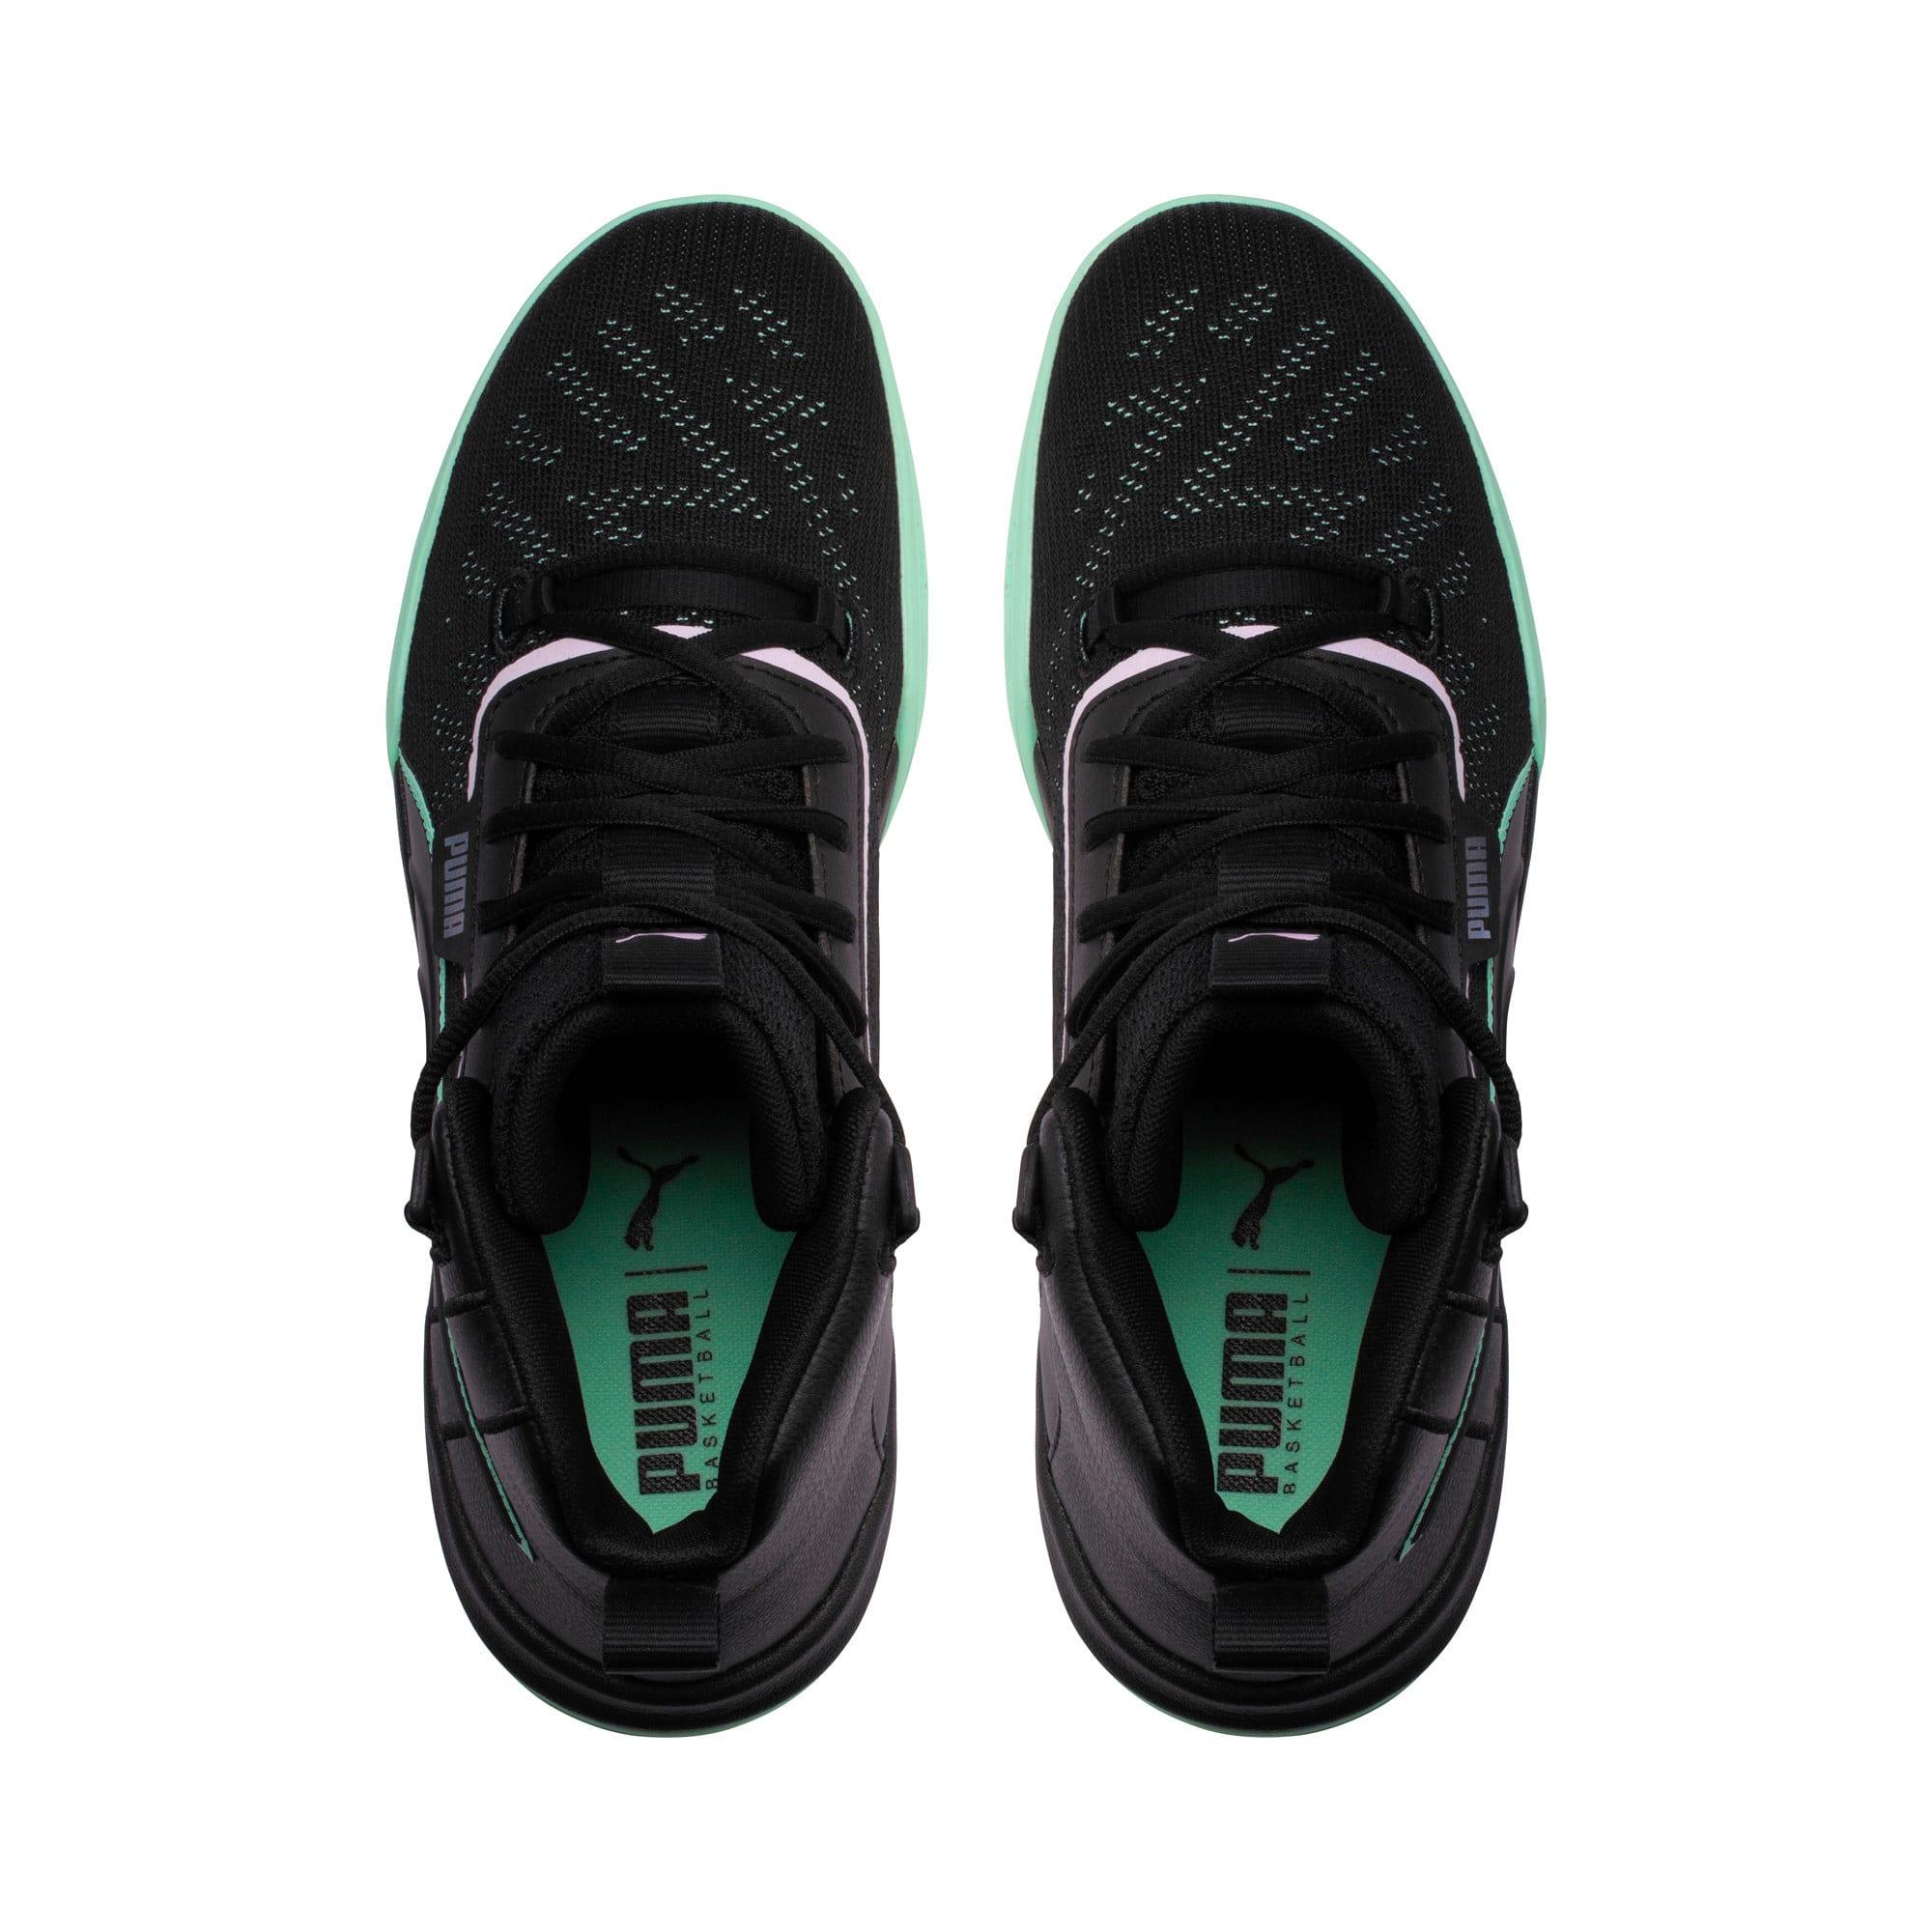 Anteprima 6 di Legacy Dark Mode Basketball Shoes, Puma Black-Orchid Bloom, medio